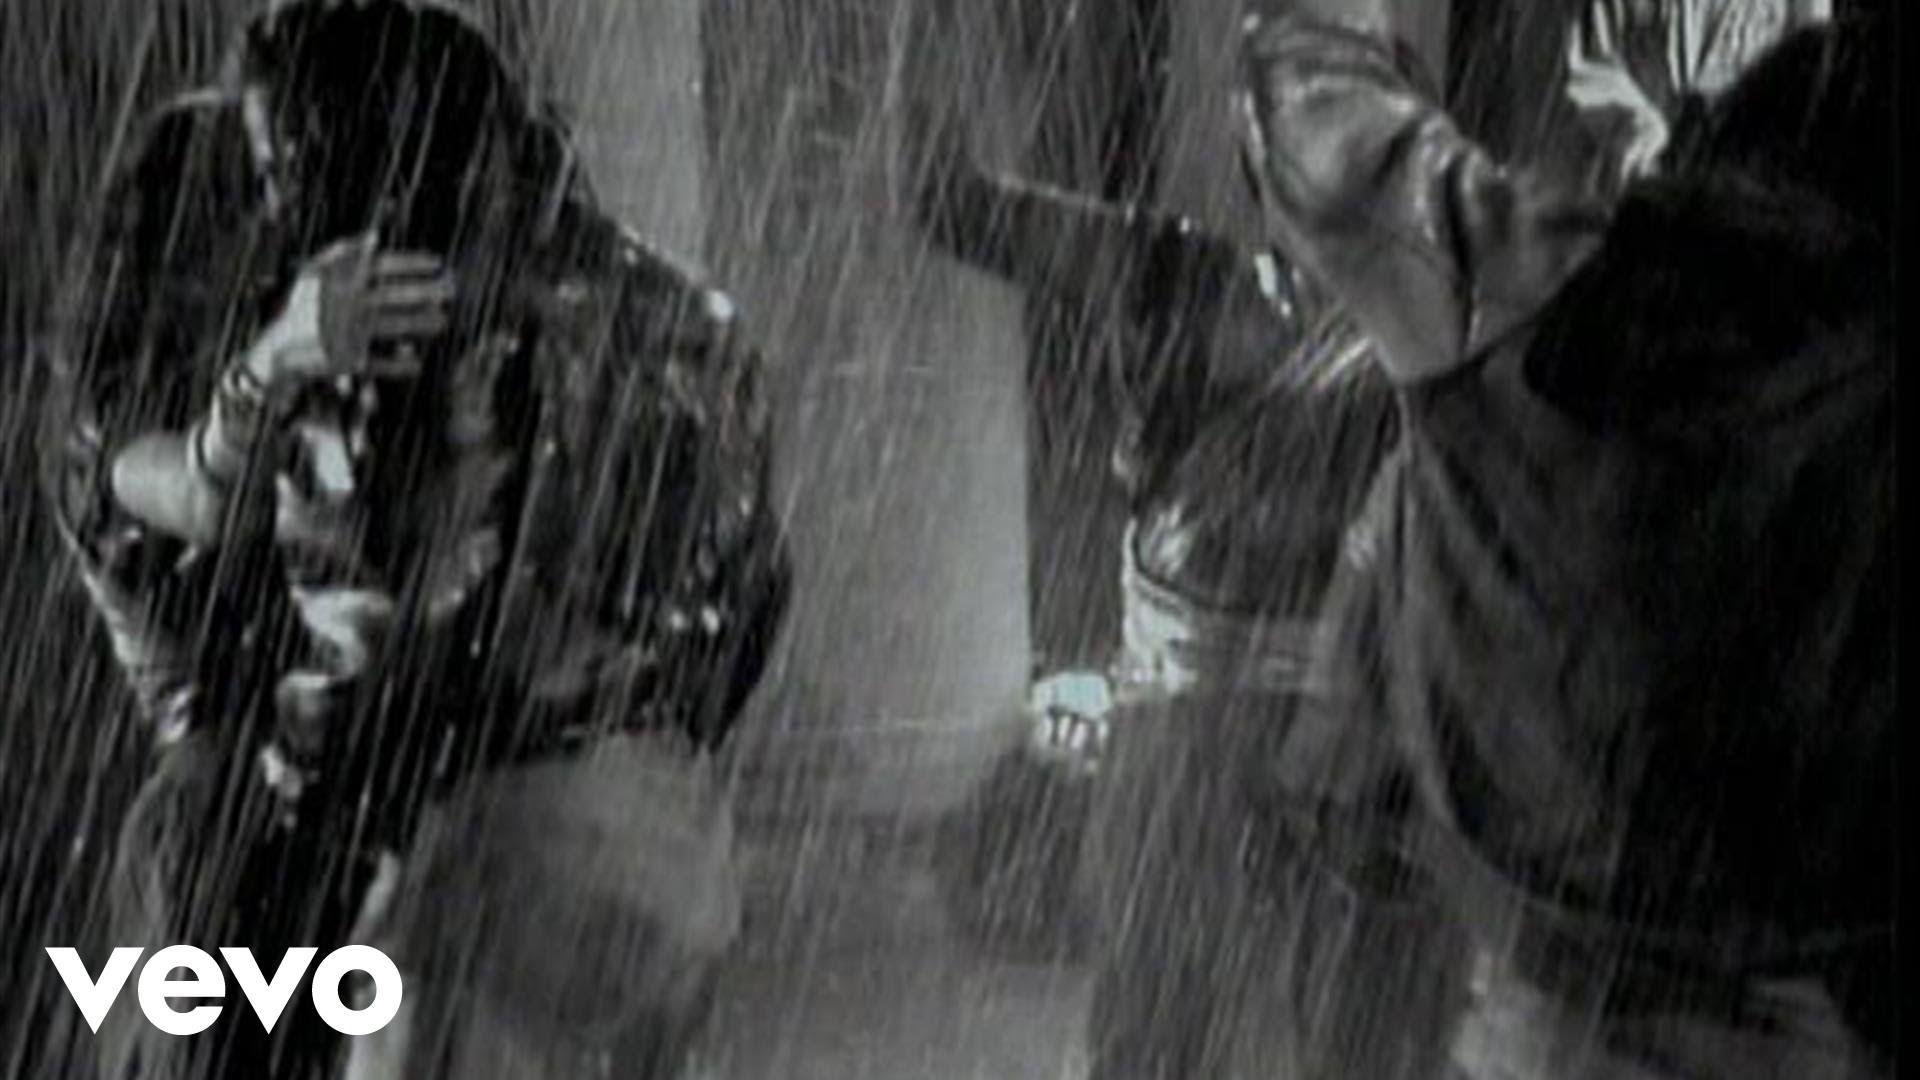 Milli Vanilli Meme Blame It On The Rain